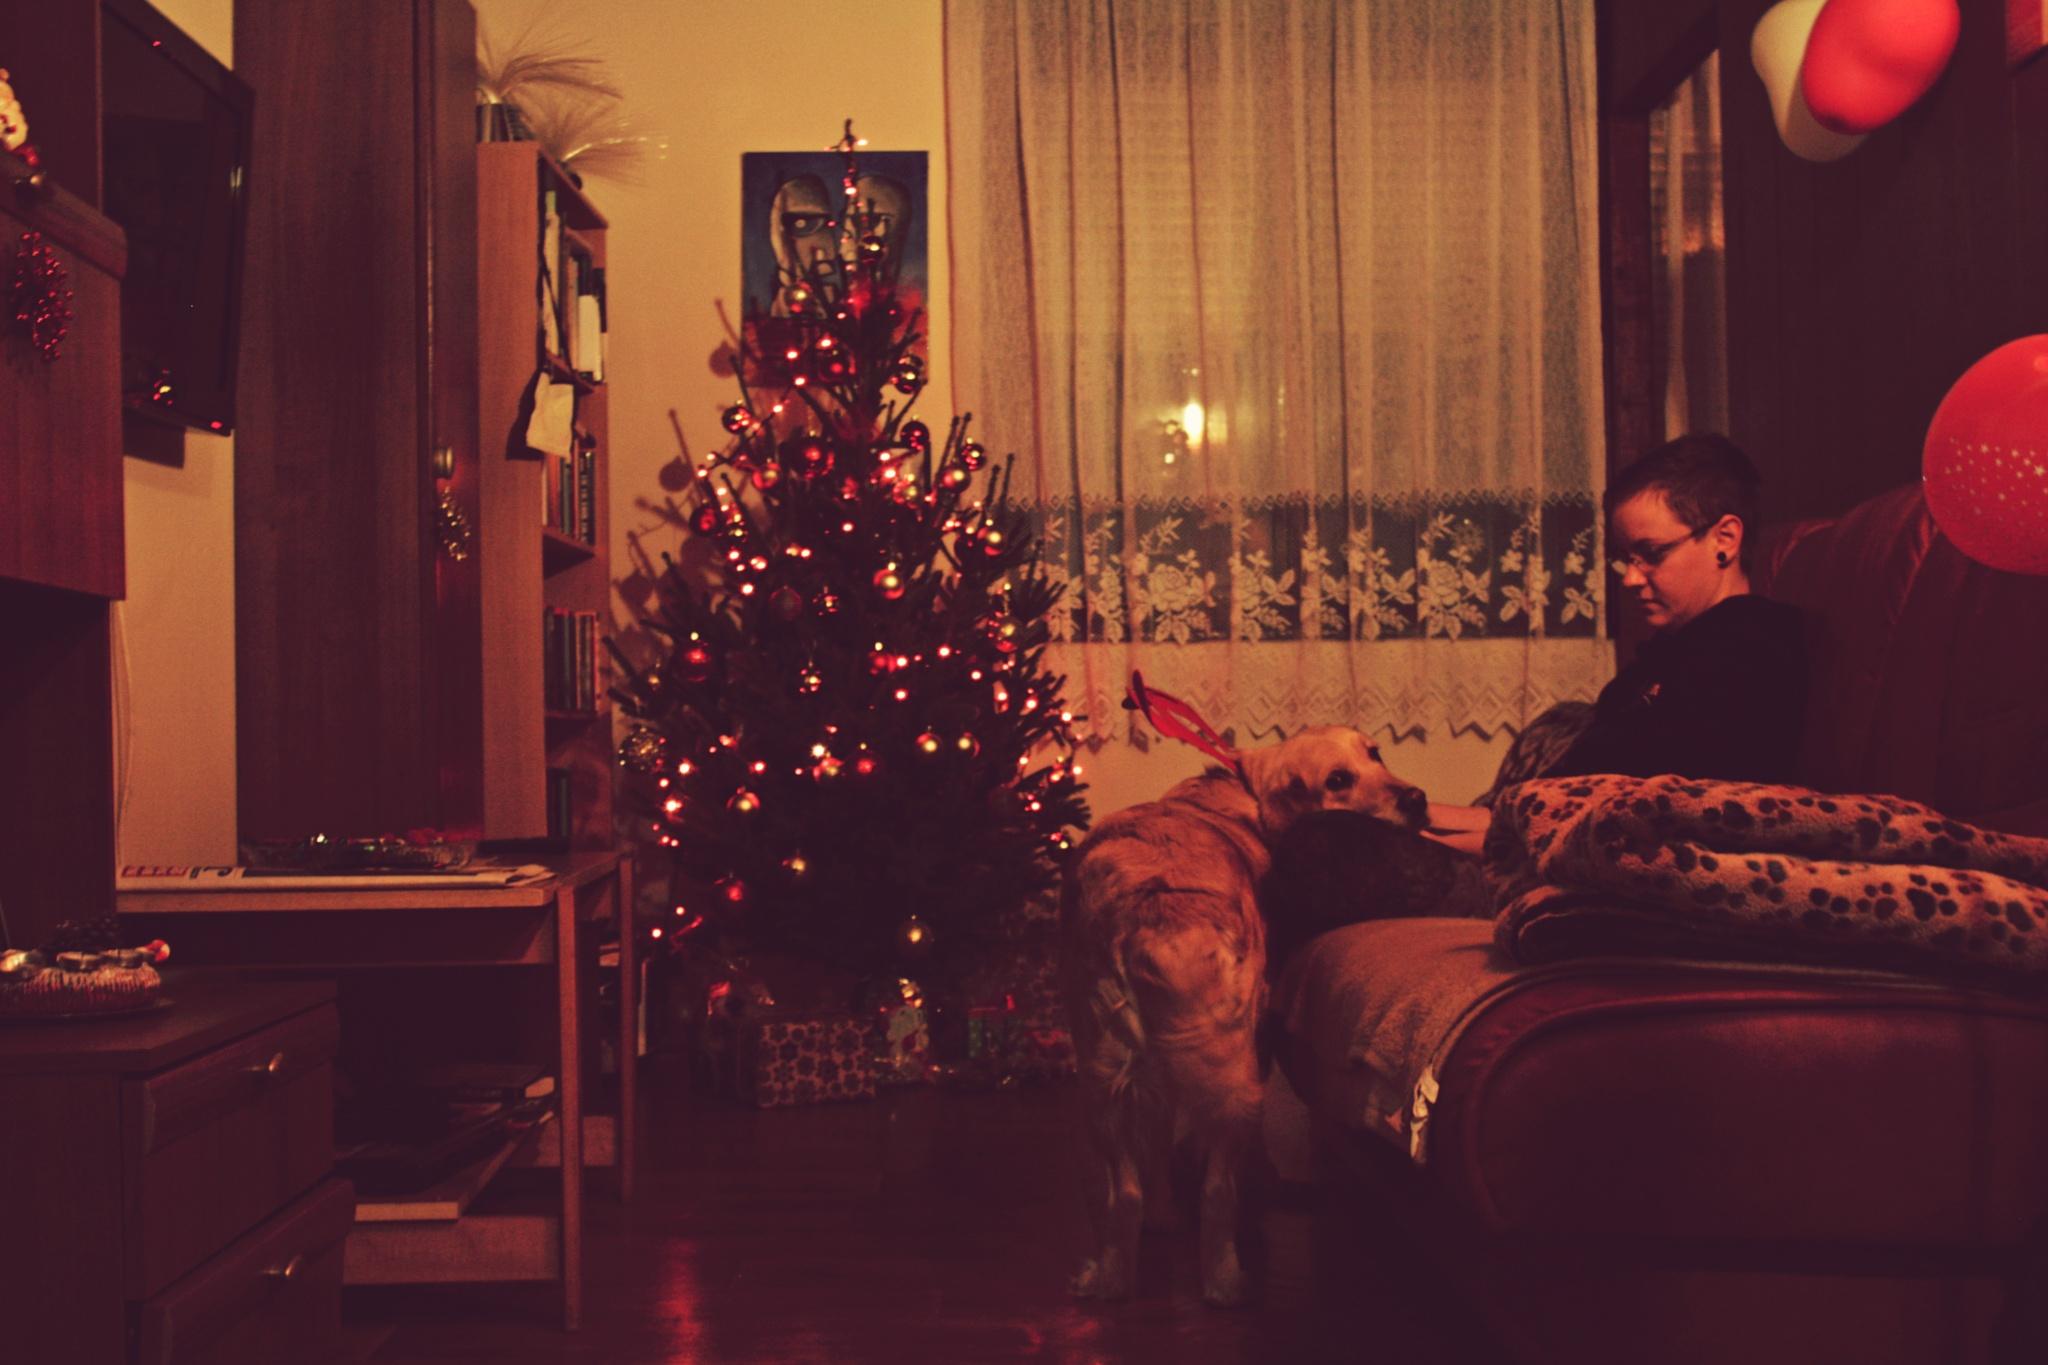 christmas is coming by Dragan Dvorski